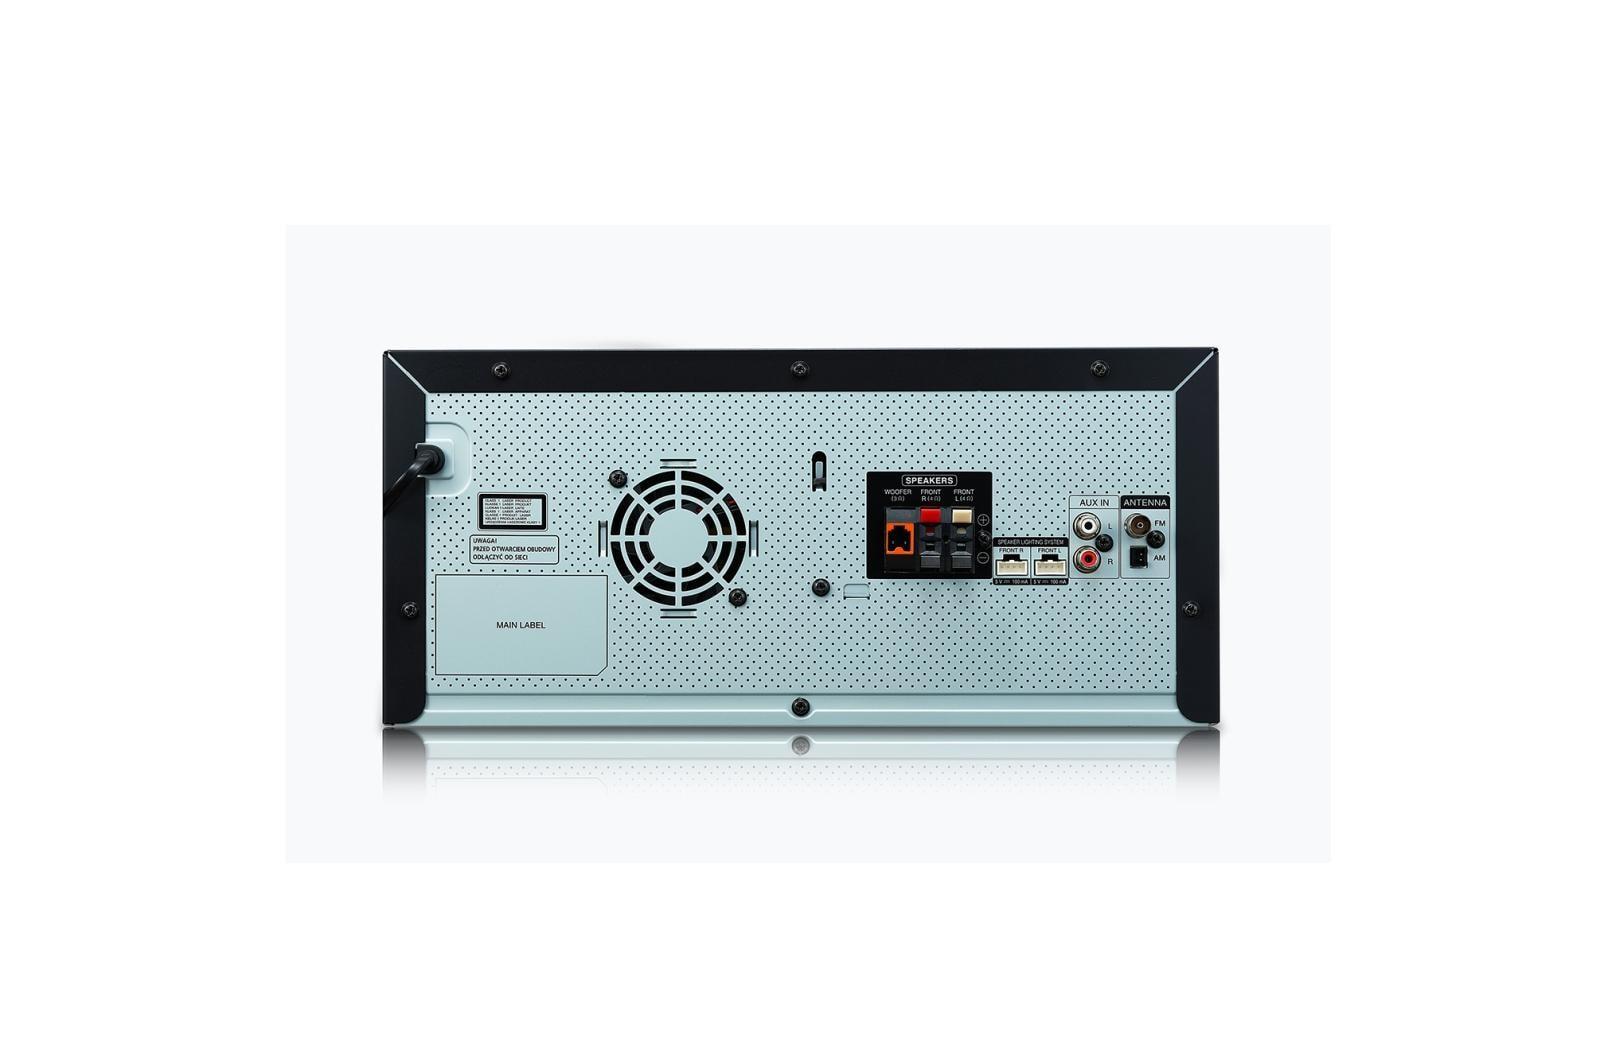 LG CK57: LG XBOOM 1100W Hi-Fi Entertainment System with Karaoke ...